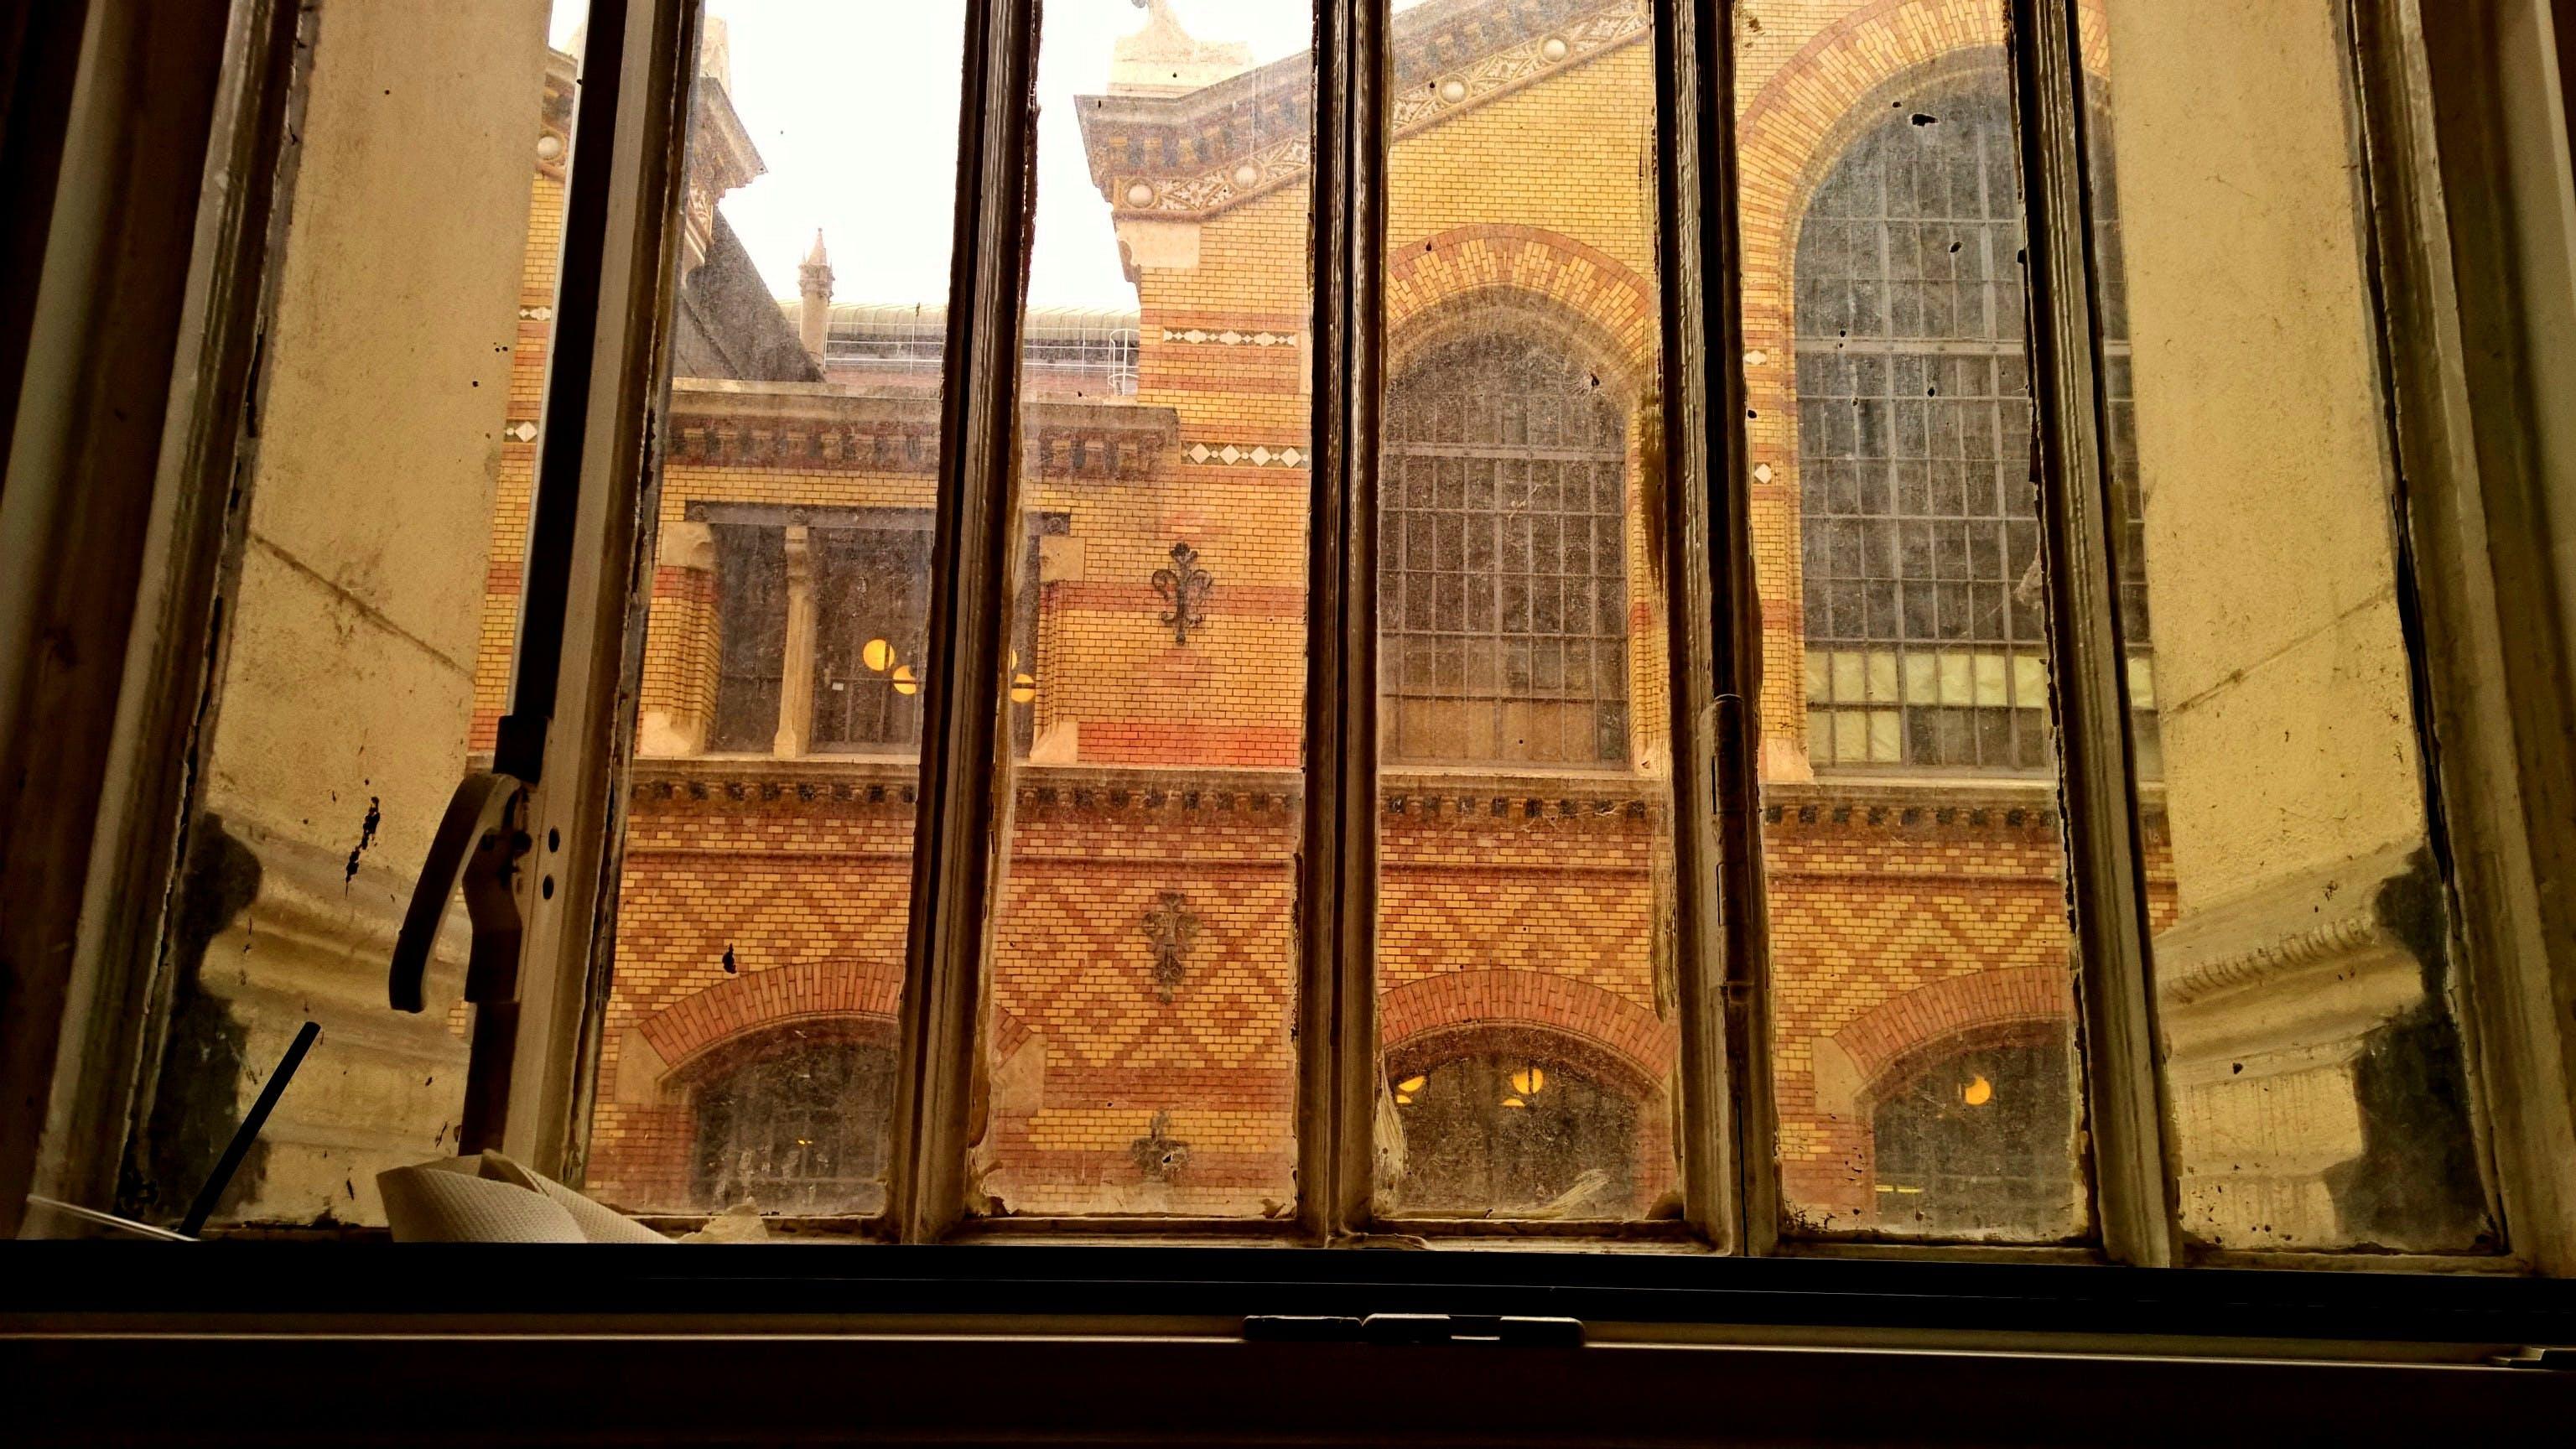 Free stock photo of window, urban, hungary, Budapest